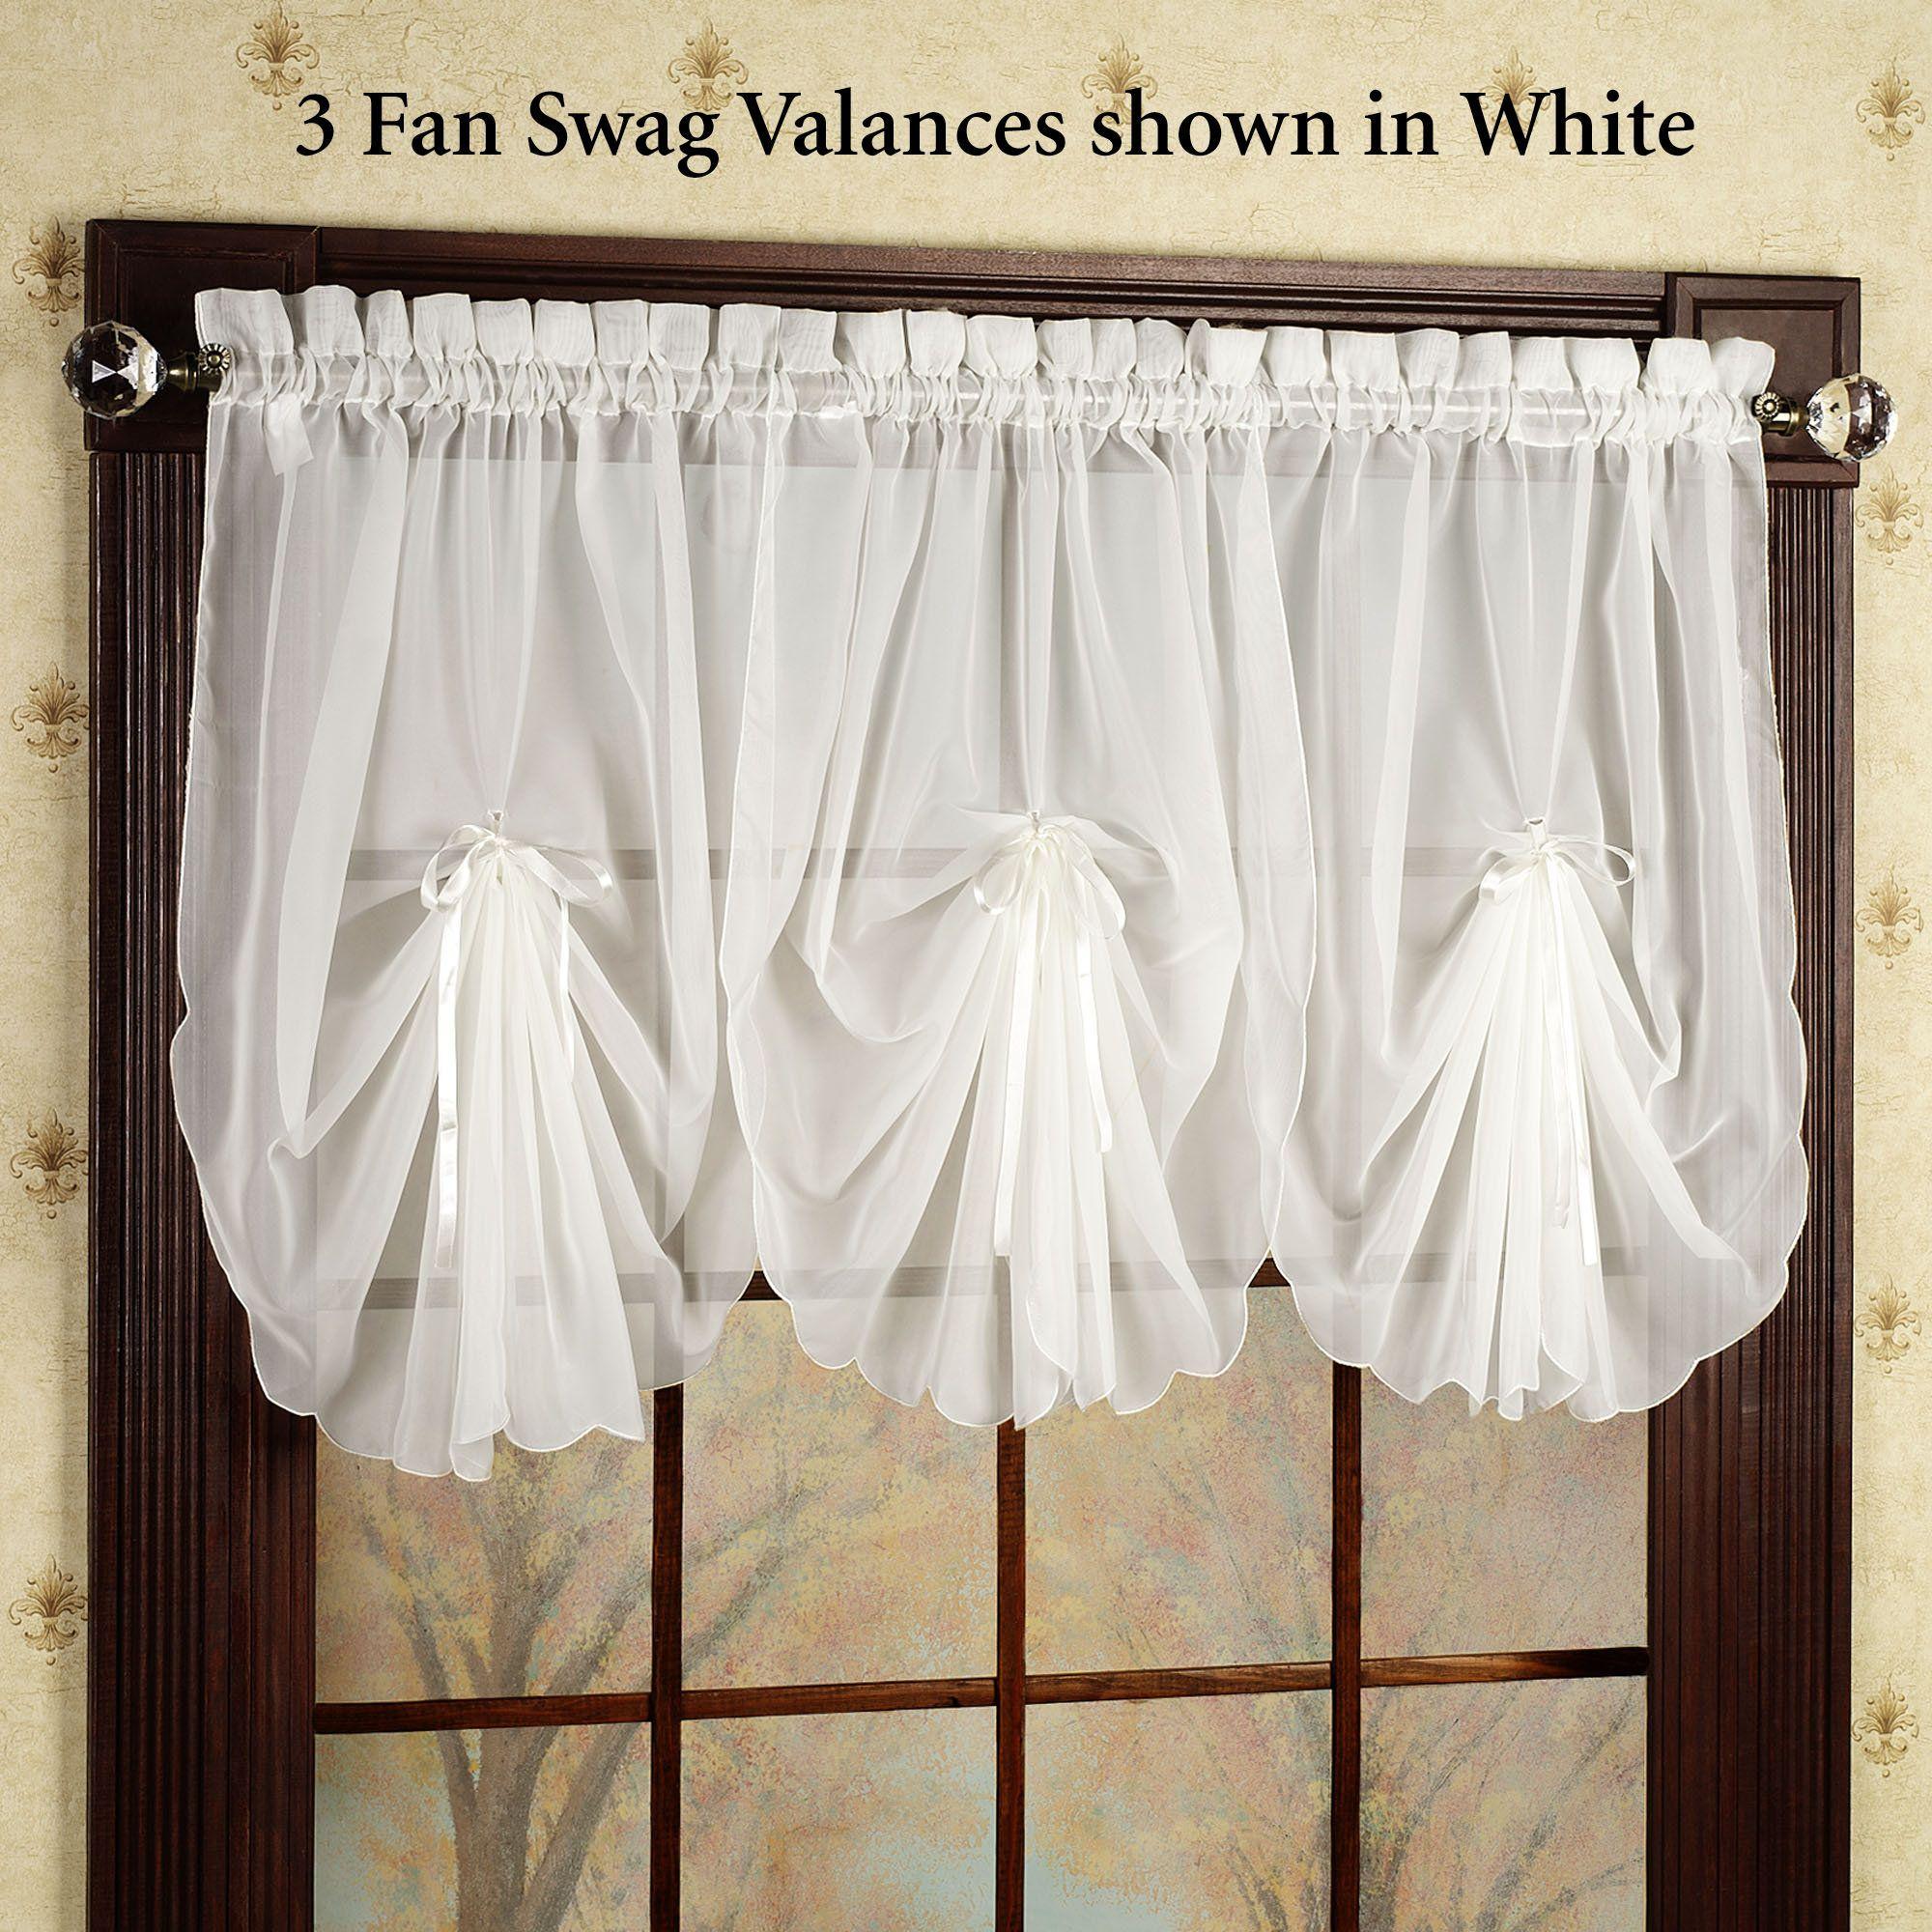 Emelia Sheer Fan Swag Valances Curtains Valance Bedroom Valances